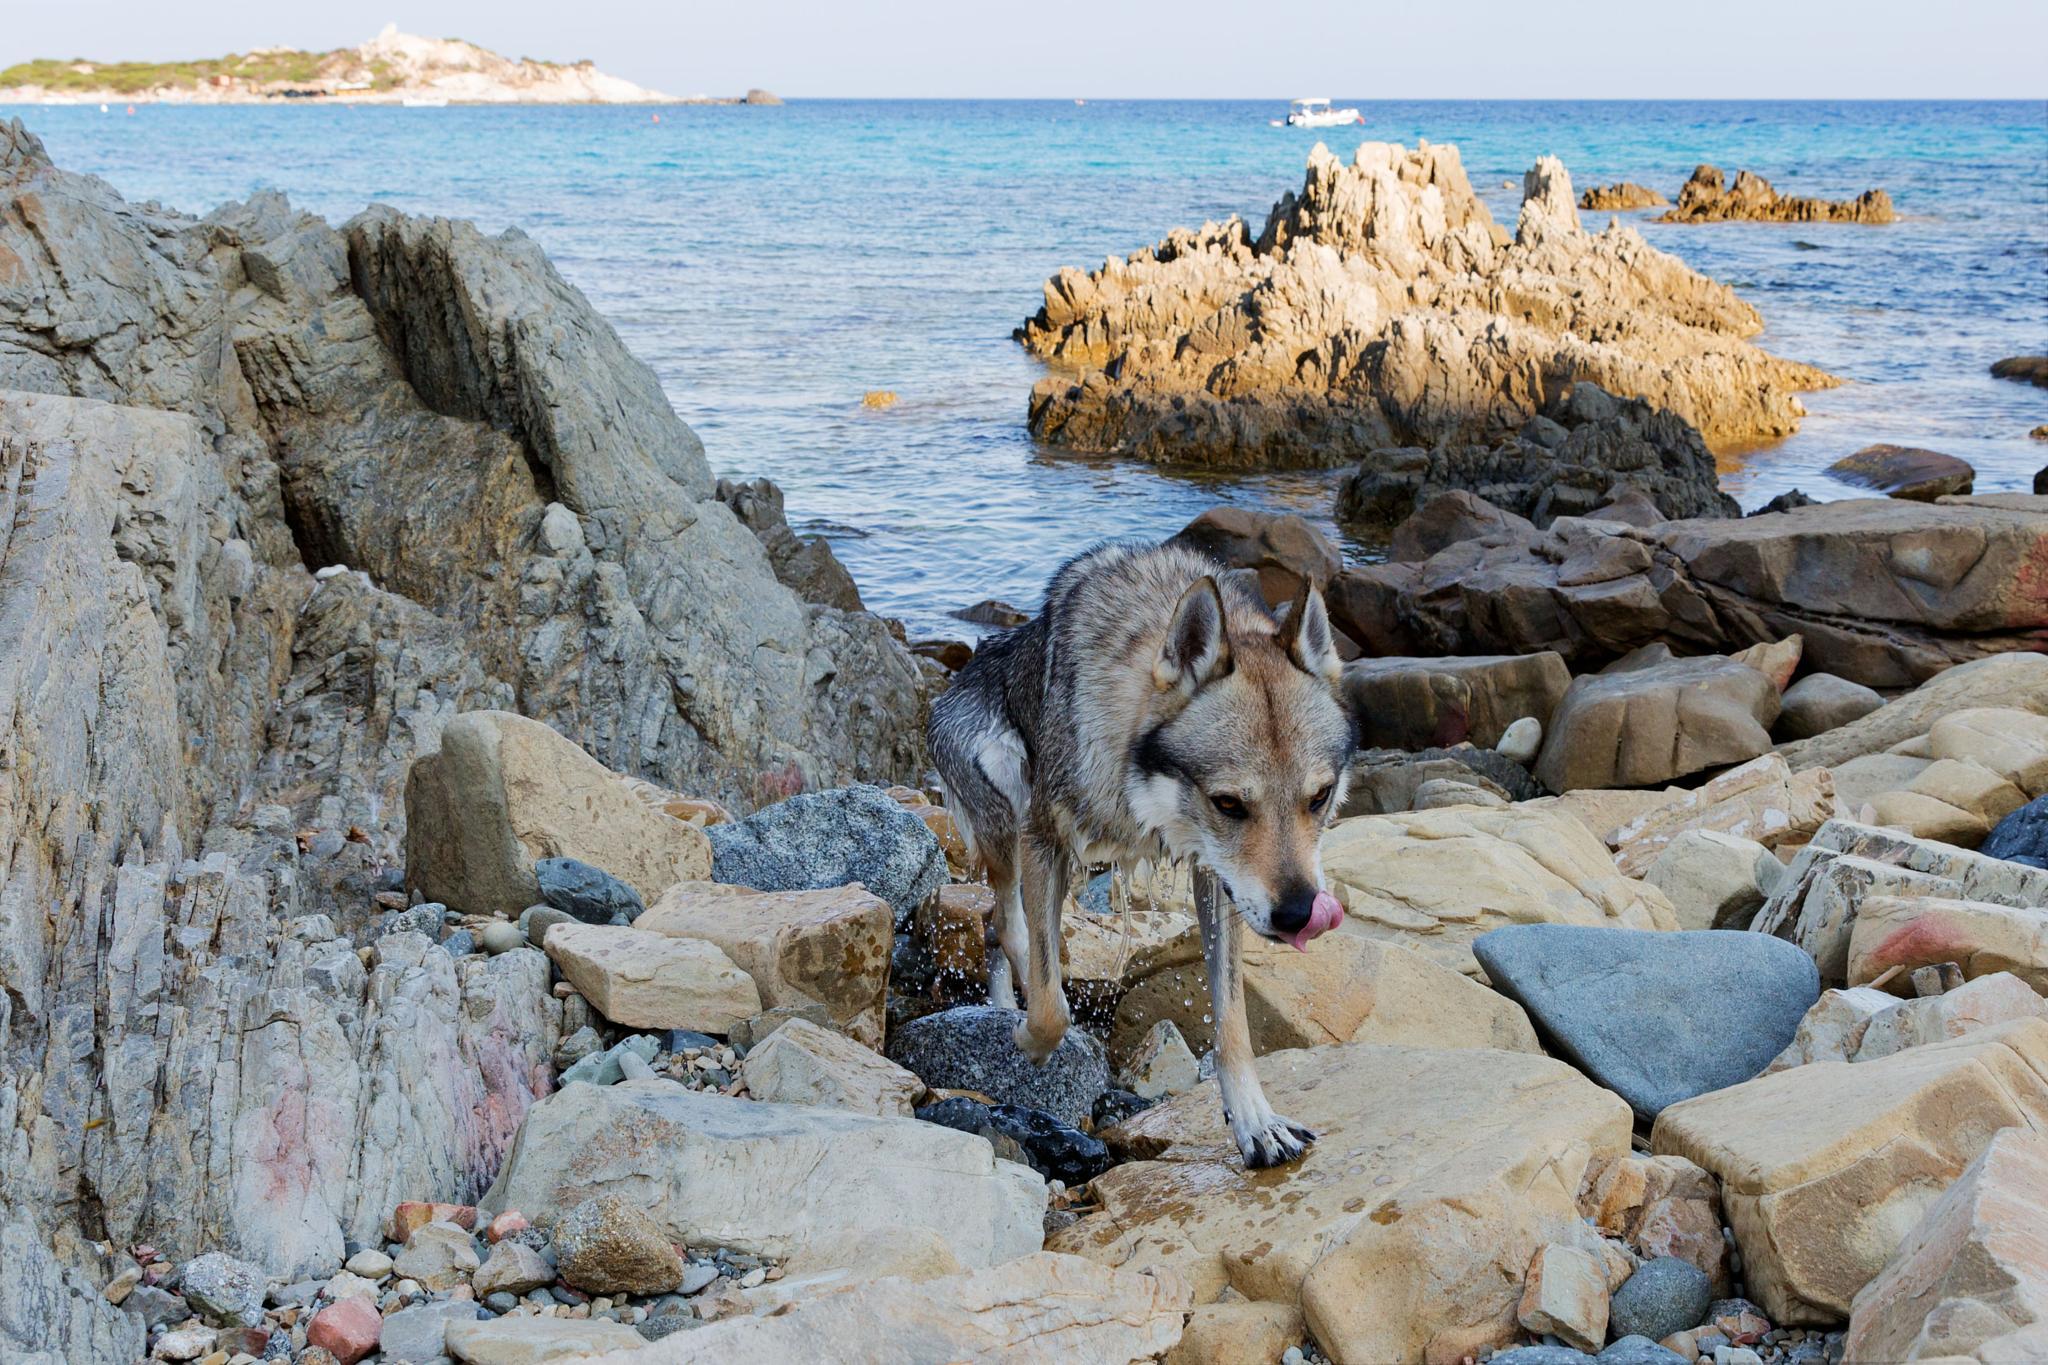 On the Rocks by Francesco Cinque